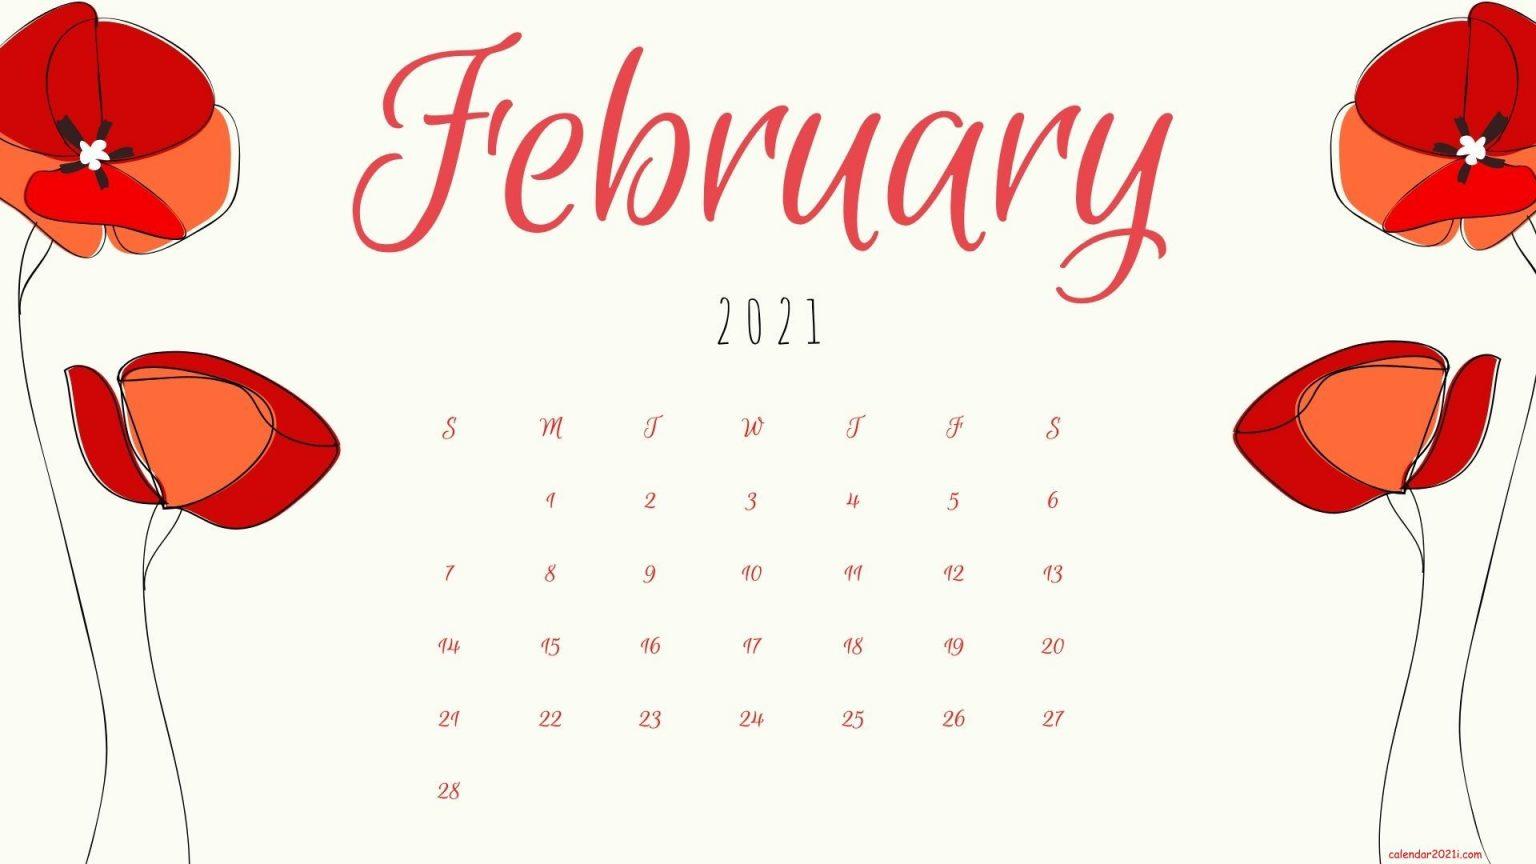 February 2021 Floral Calendar Wallpaper